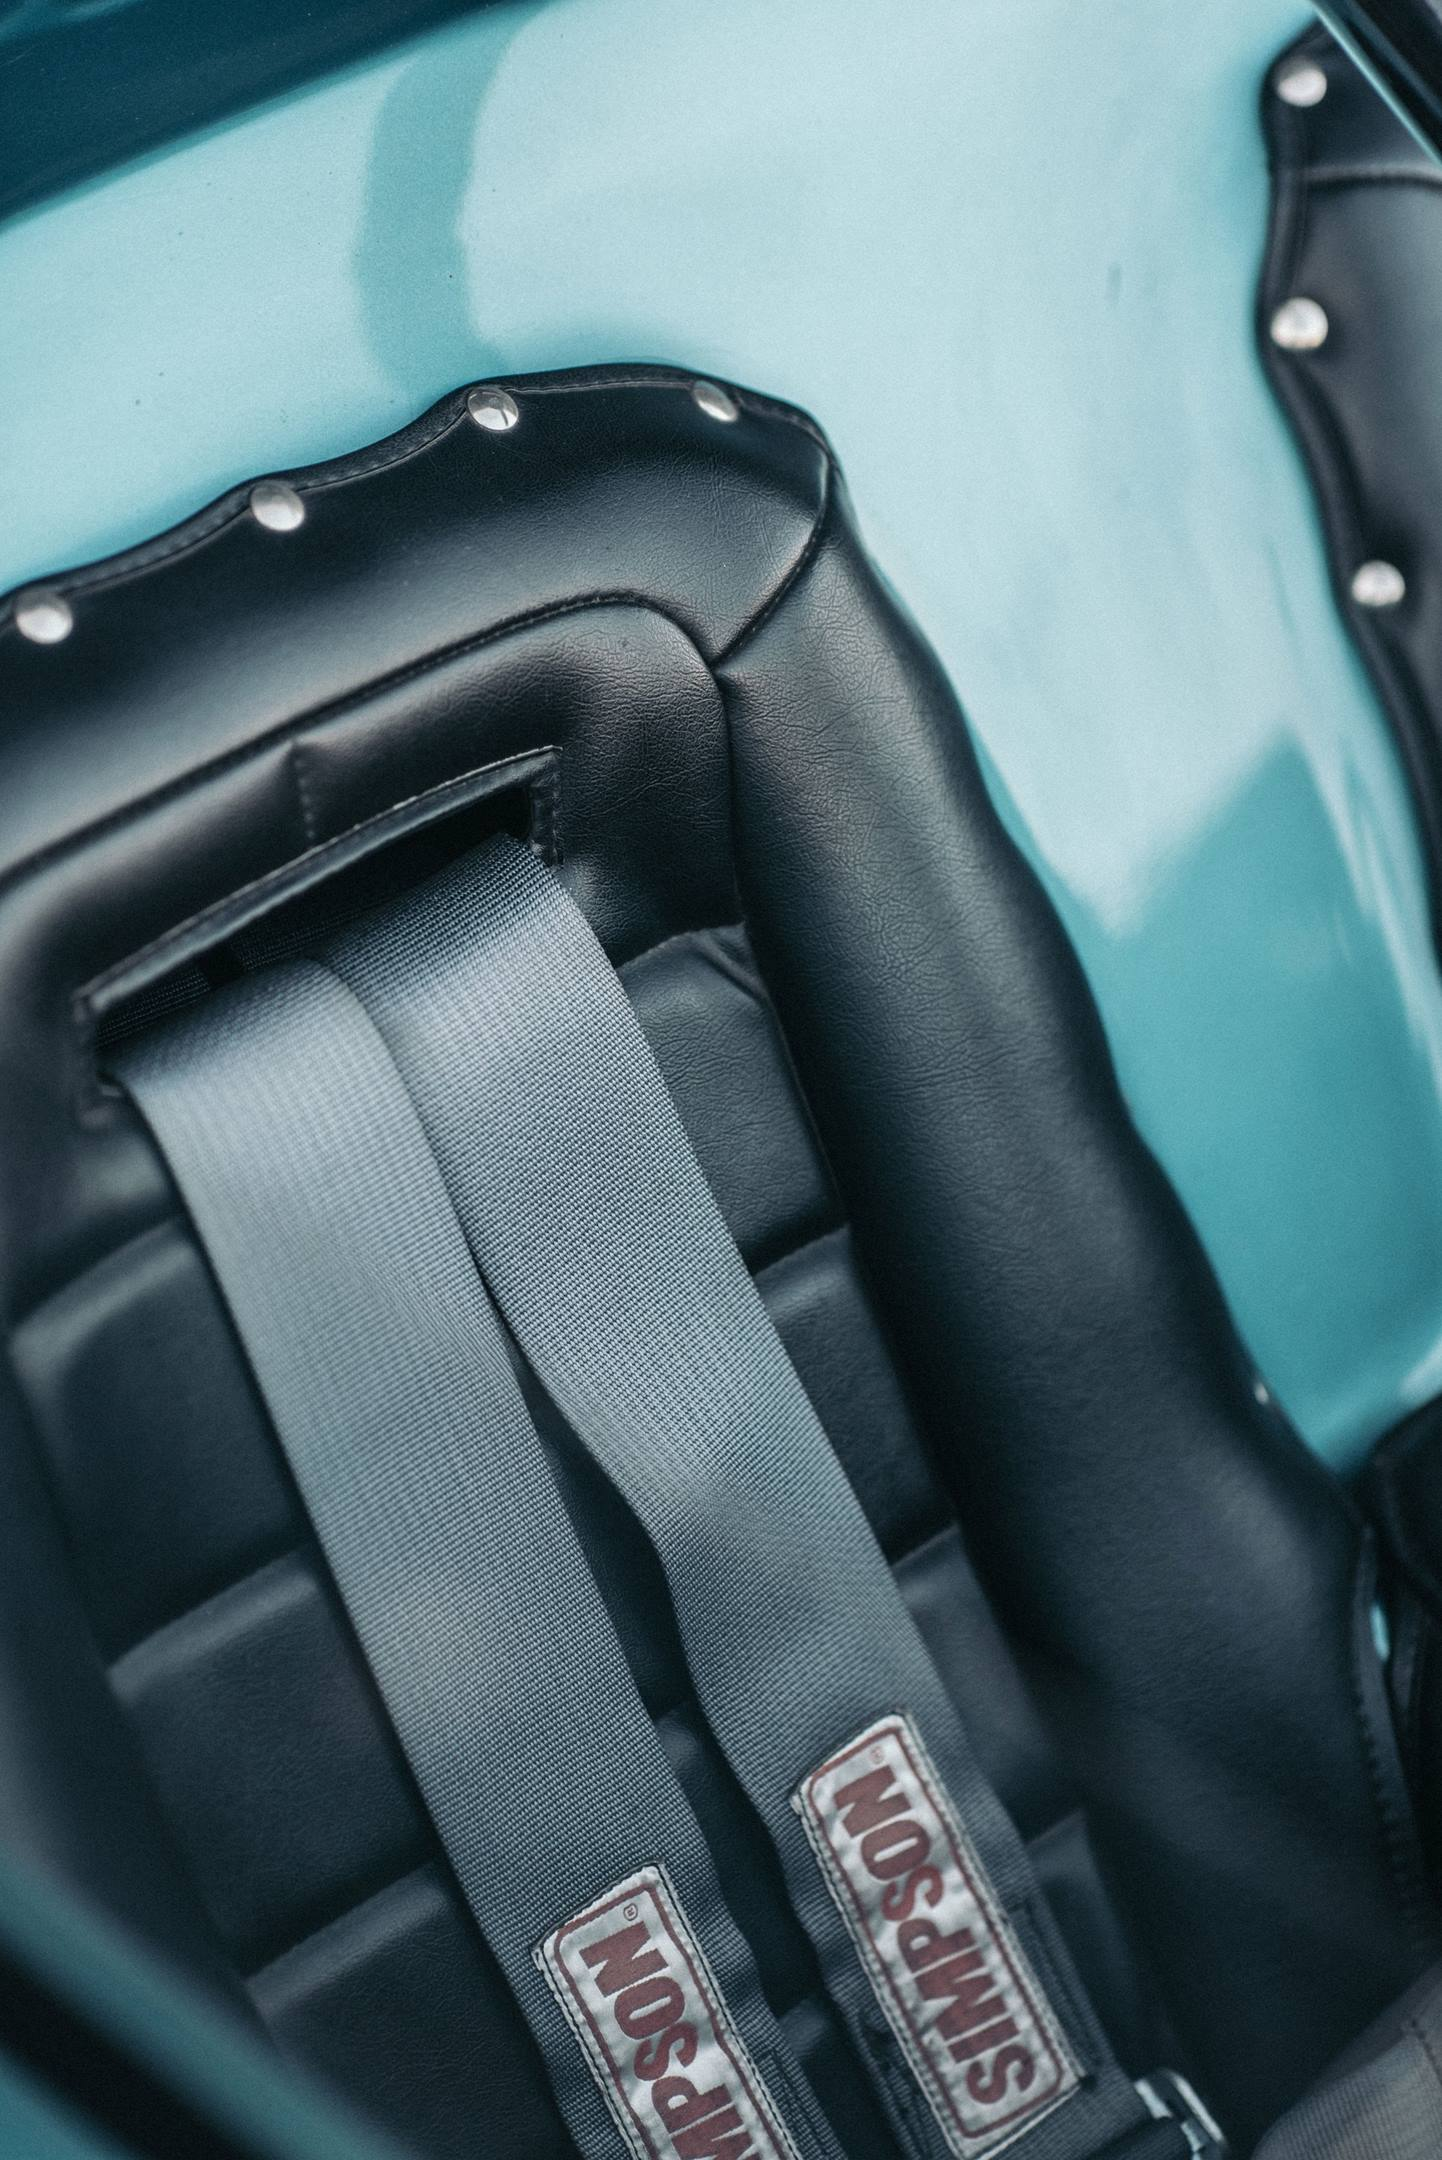 AMT Piranha seat detail